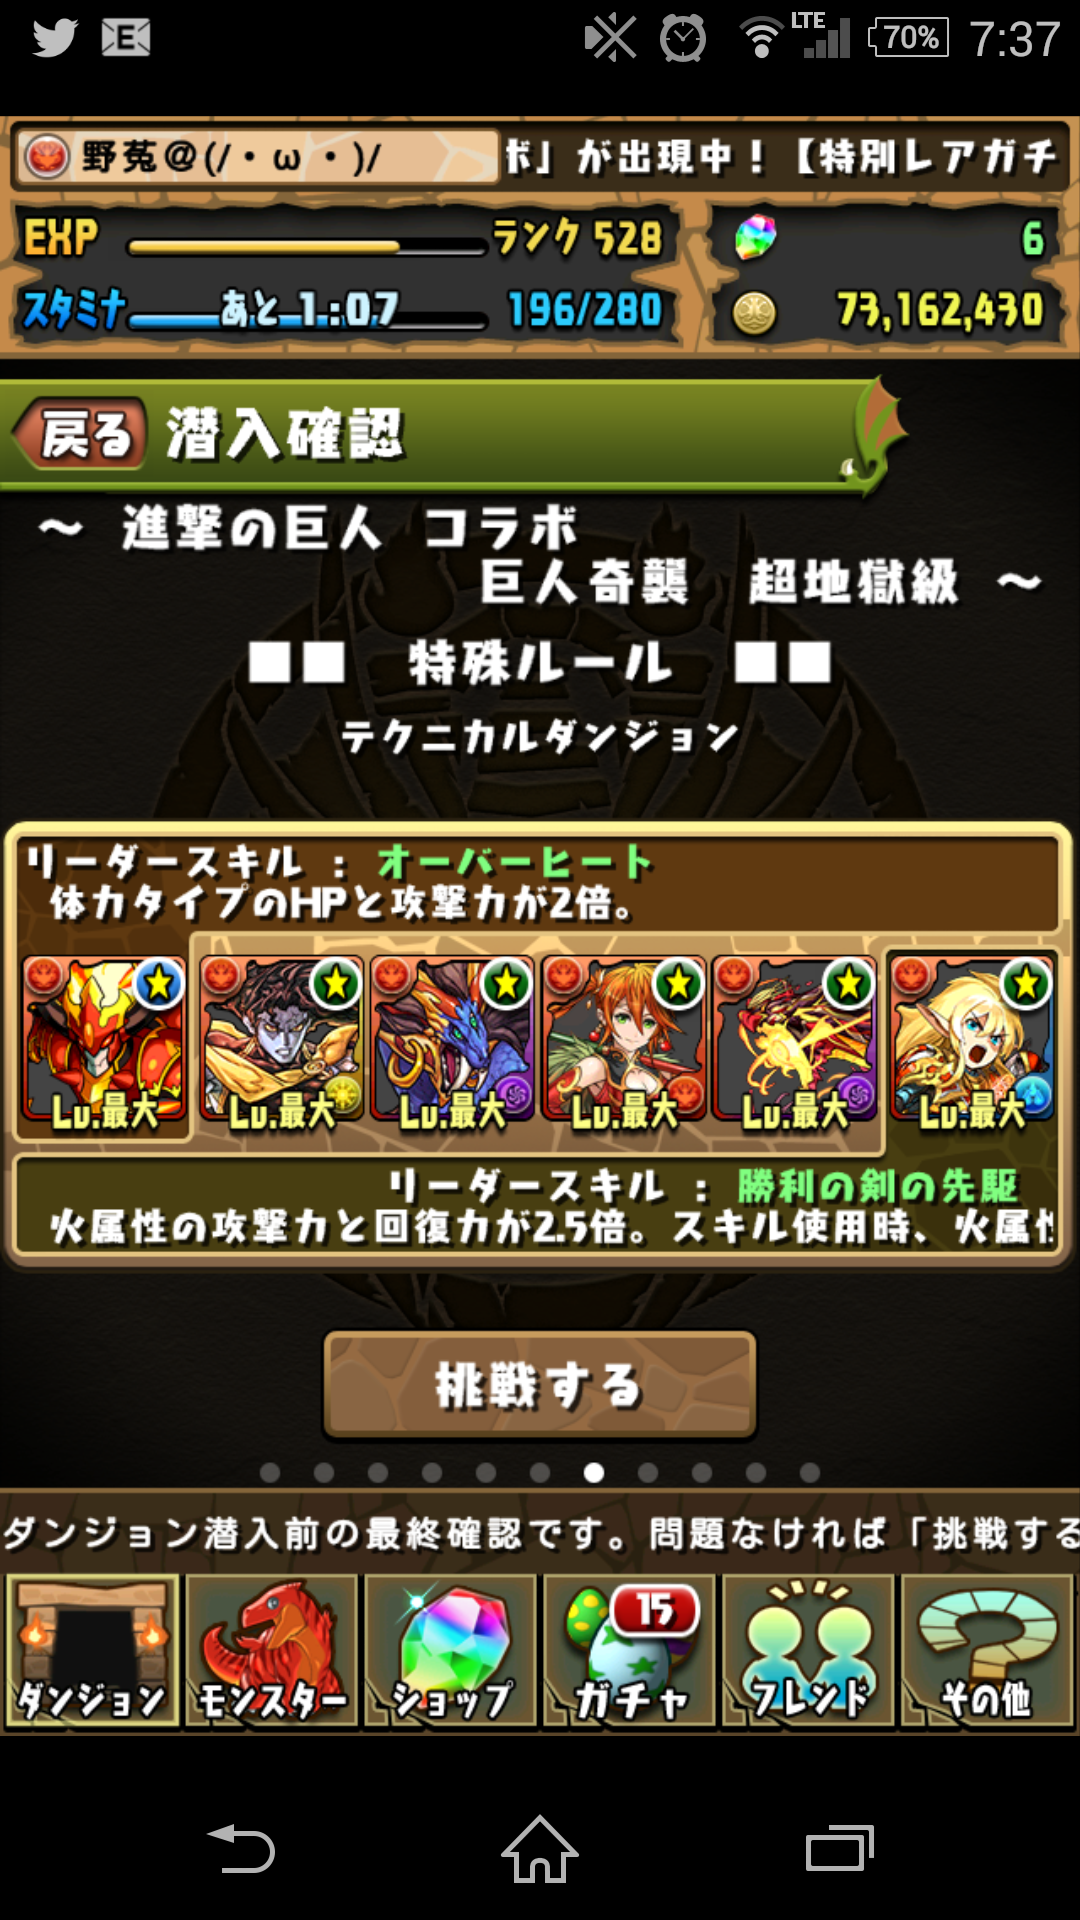 Screenshot_2015-10-03-19-37-35.png